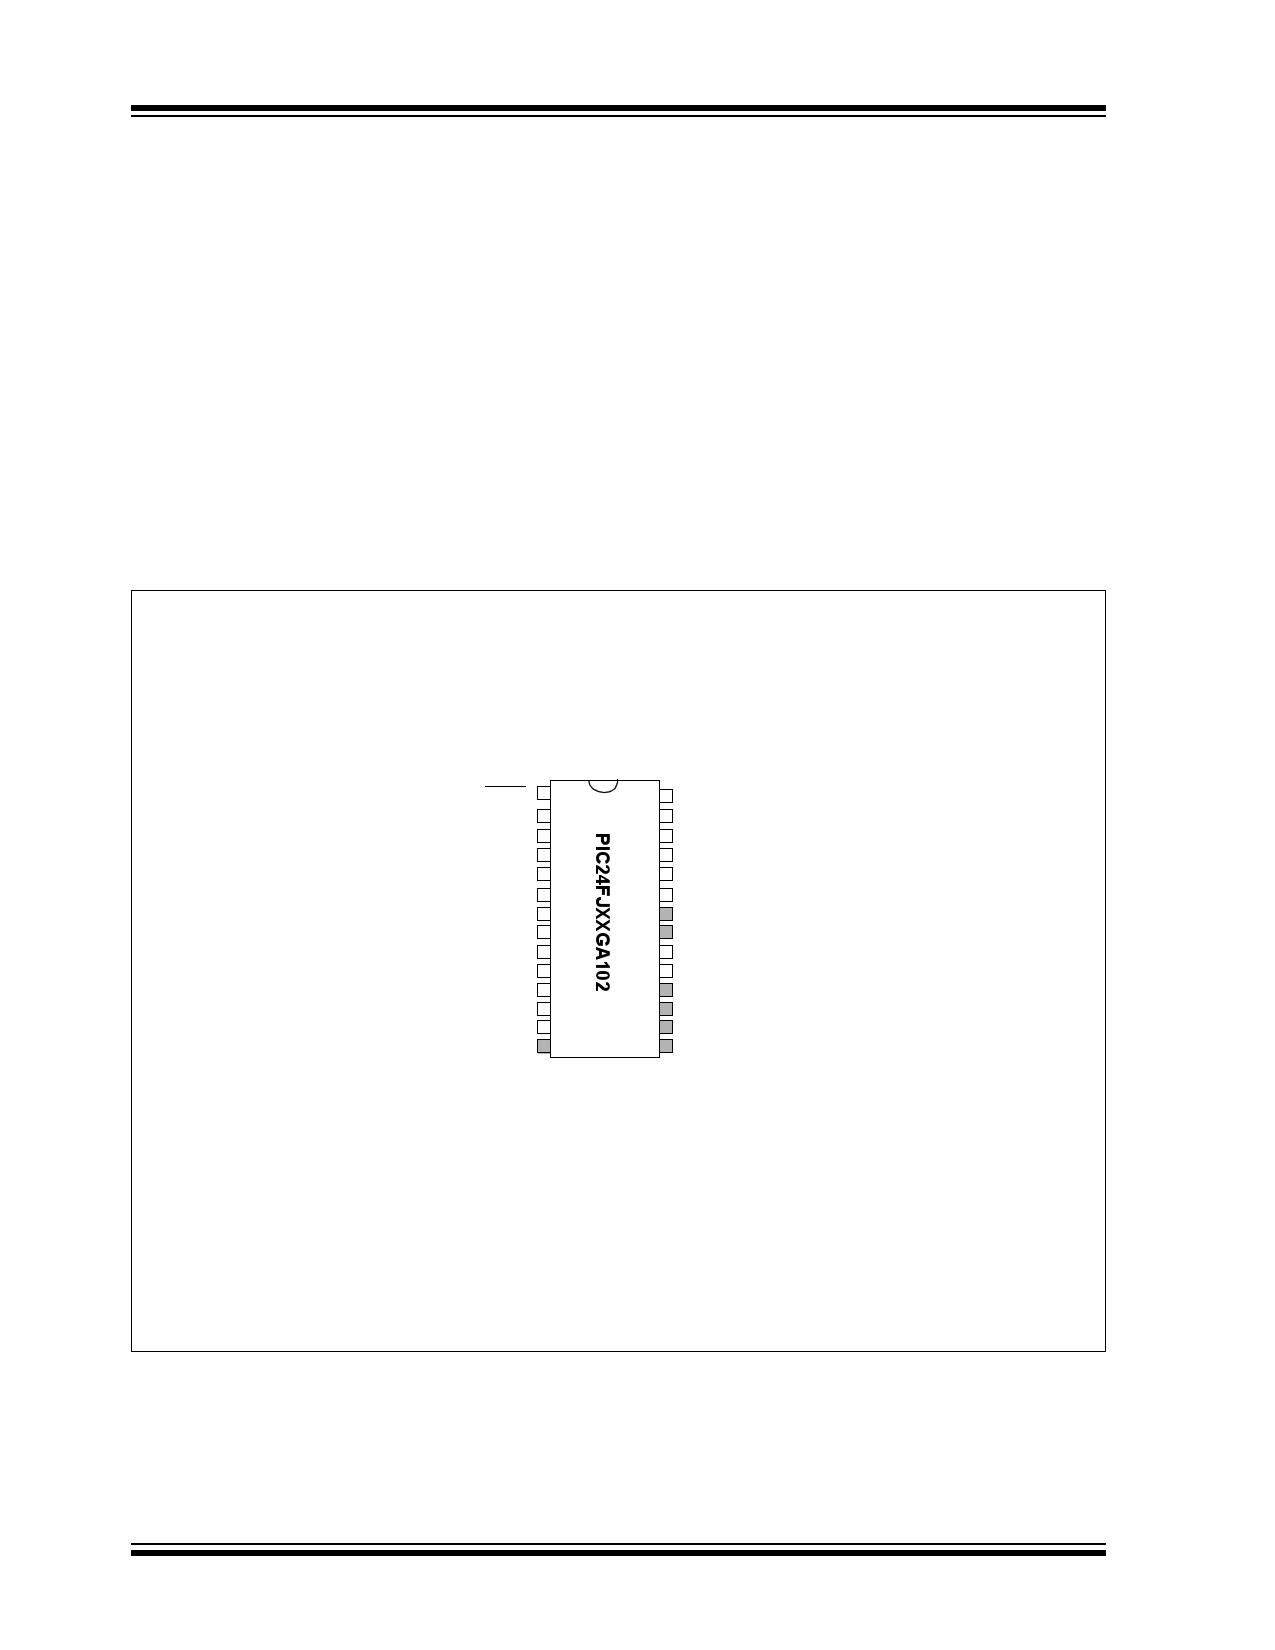 PIC24FJ32GA102 pdf, 반도체, 판매, 대치품